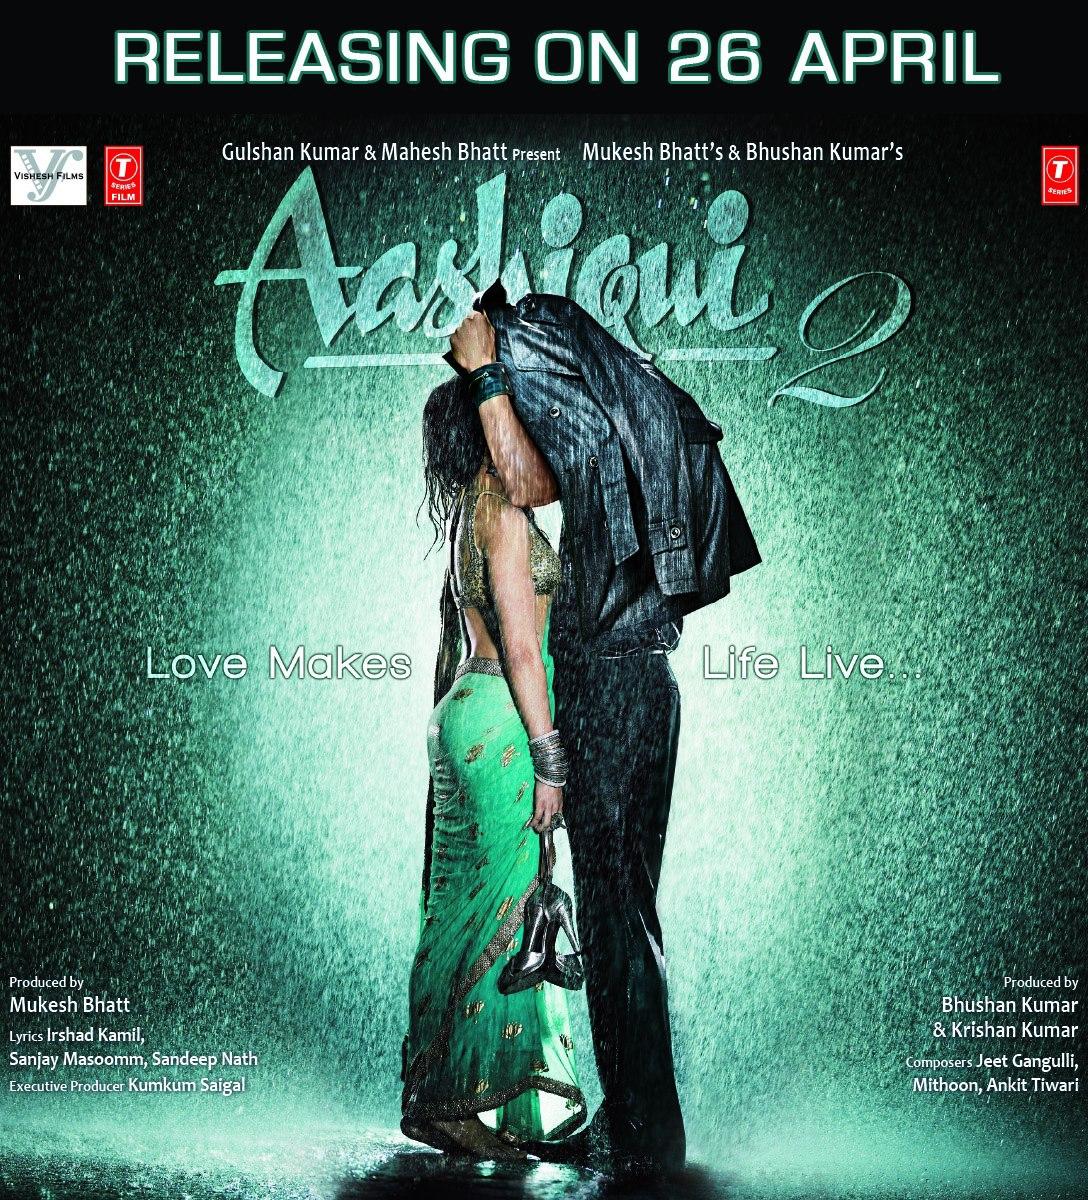 Aashiqui 2 - Movie Poster #3 (Original)